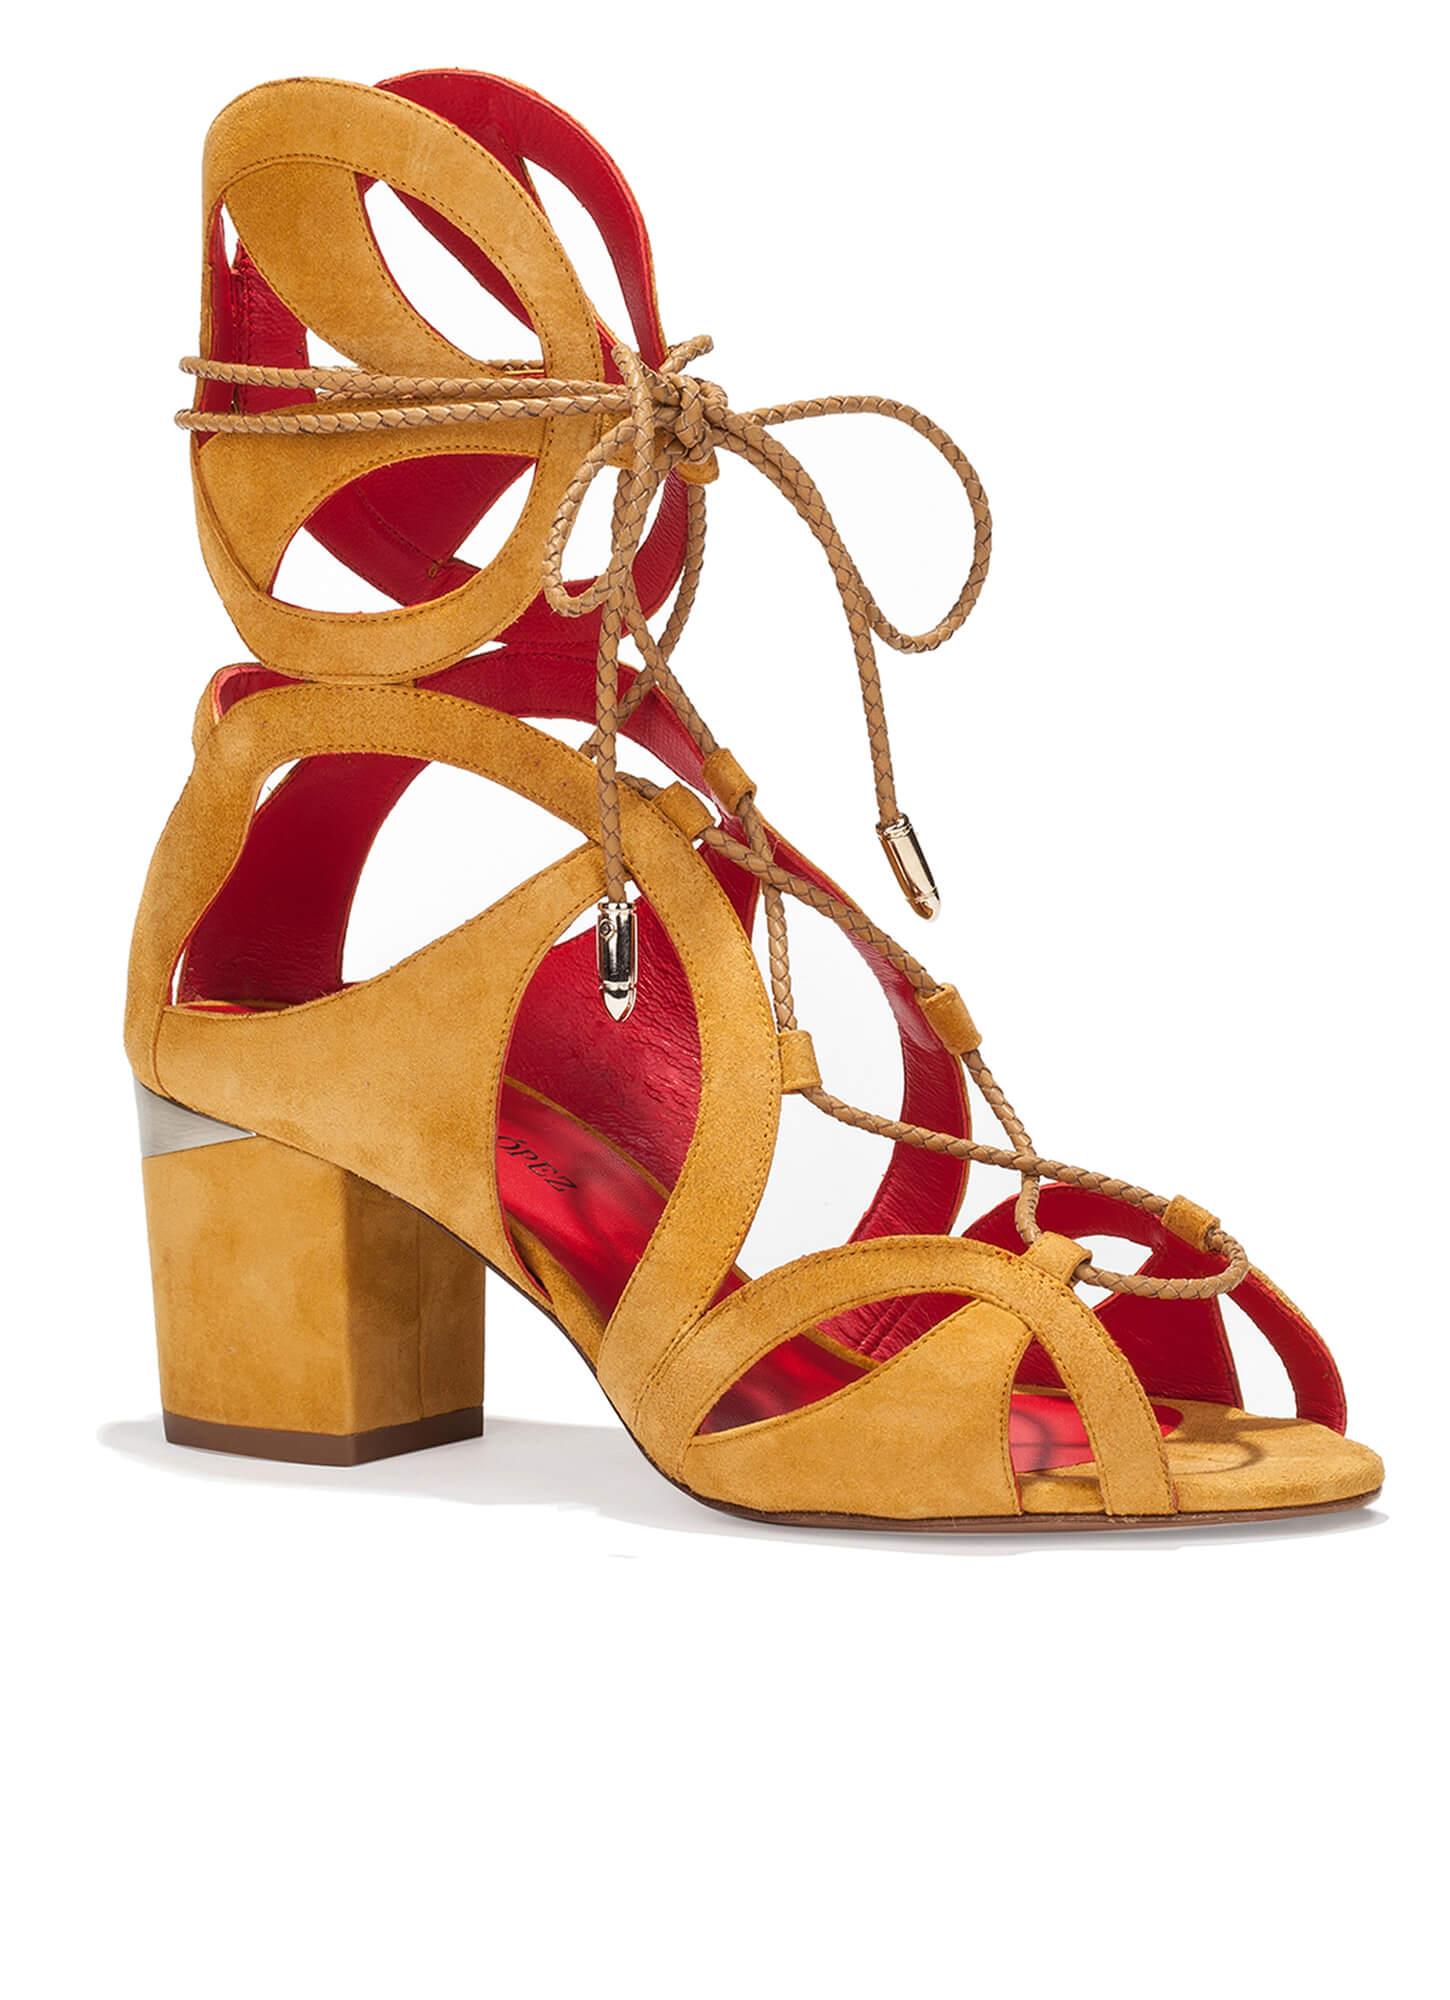 Cutout sandals in tobacco suede - shoe store Pura López . PURA LOPEZ